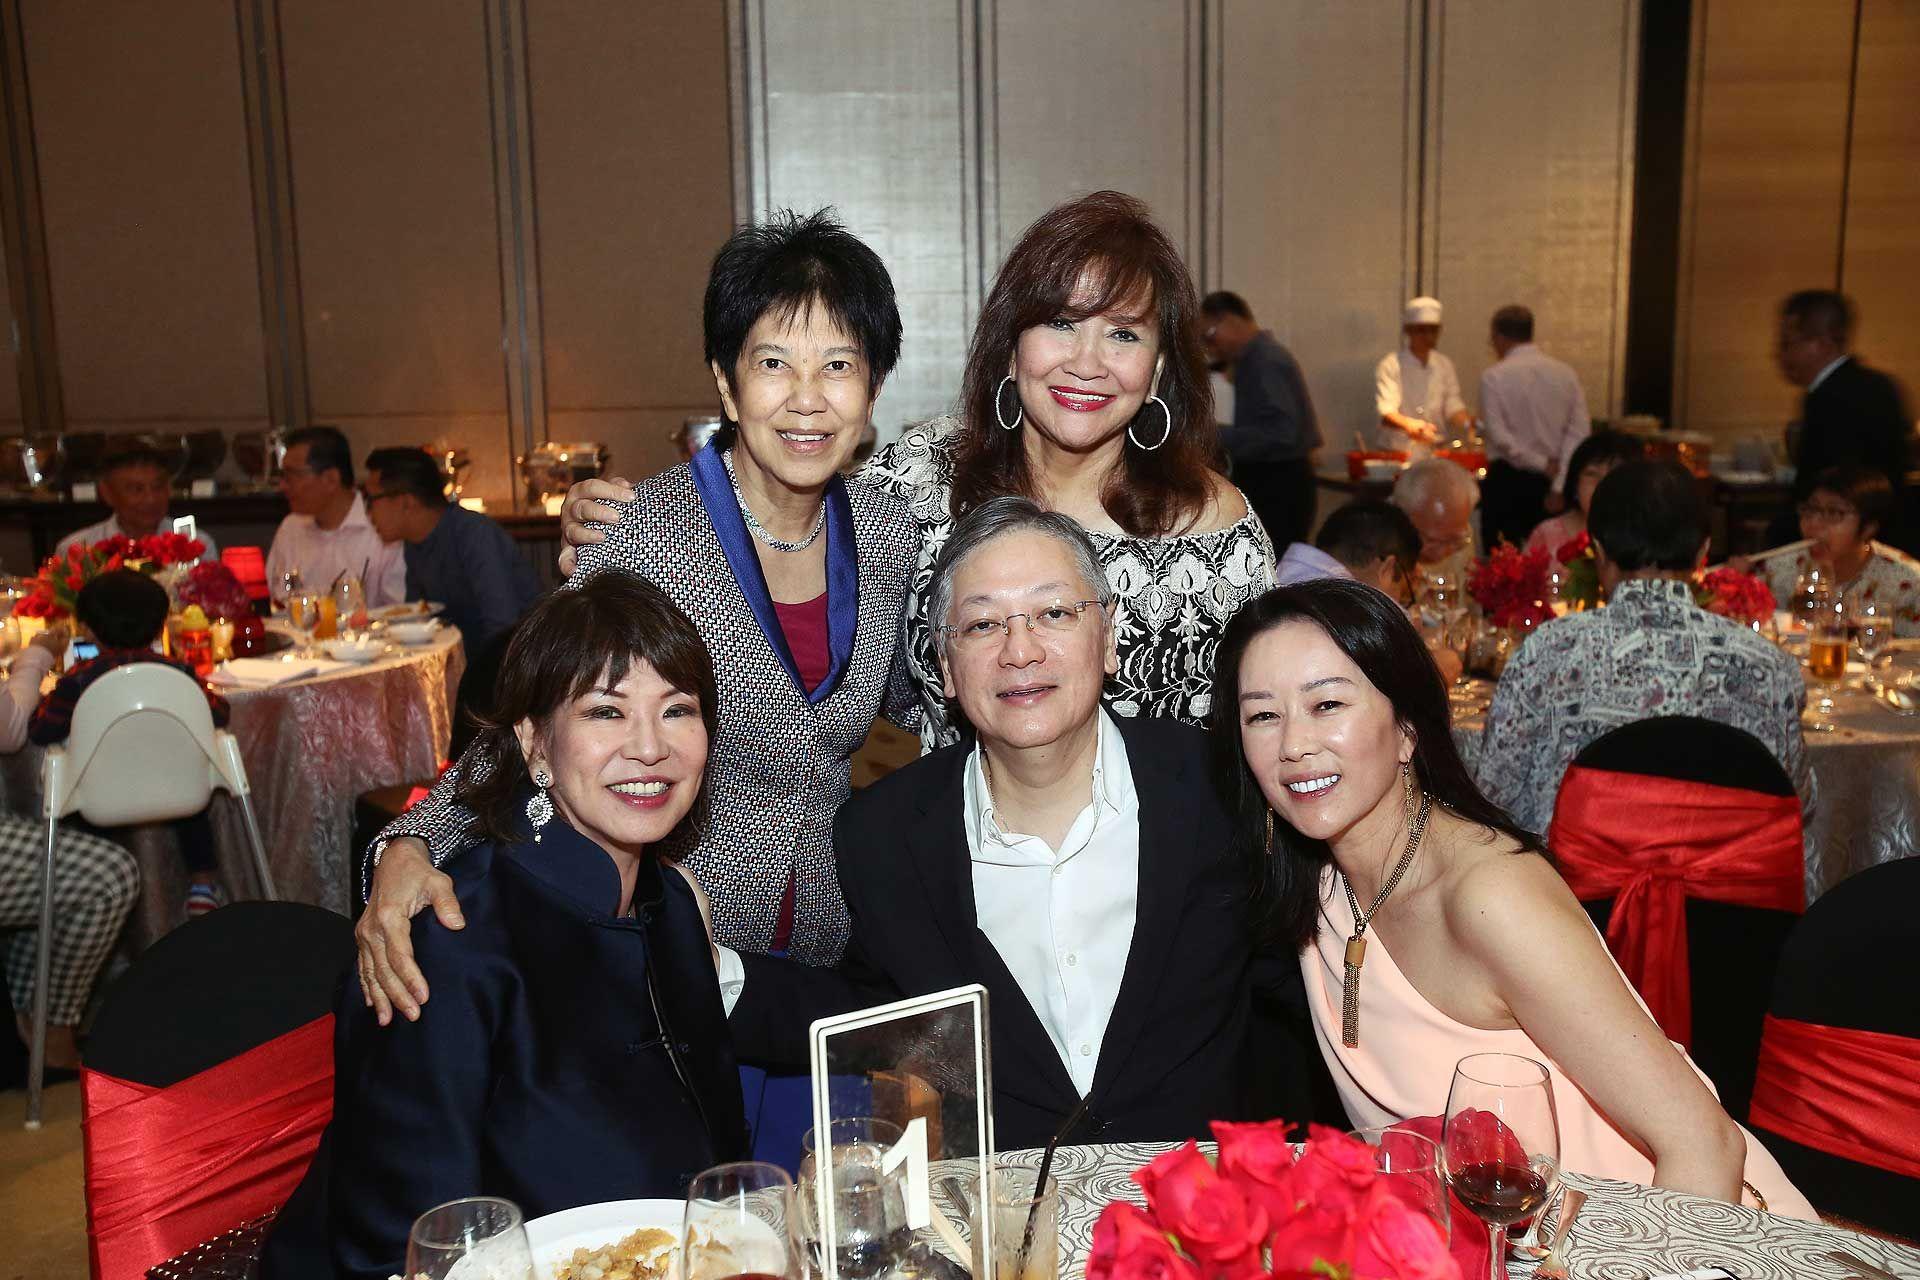 Lim Meng Hong, Chan Mo Lin, Yap Teak Sing, Dato' Rosemarie Wee and Shawna Yap